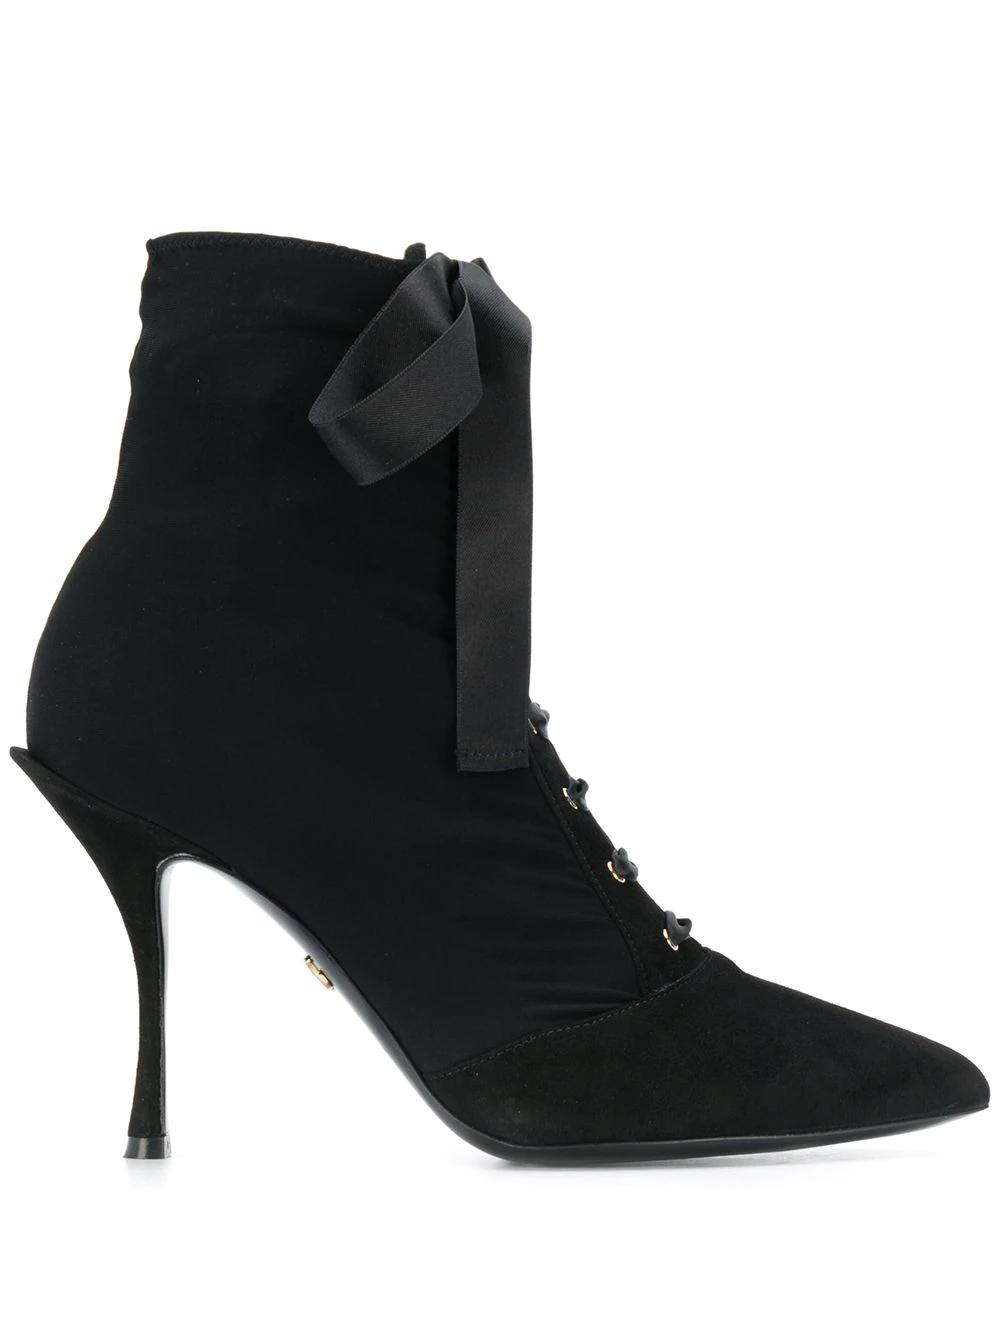 Dolce & Gabbana | ботильоны на шнуровке | Clouty